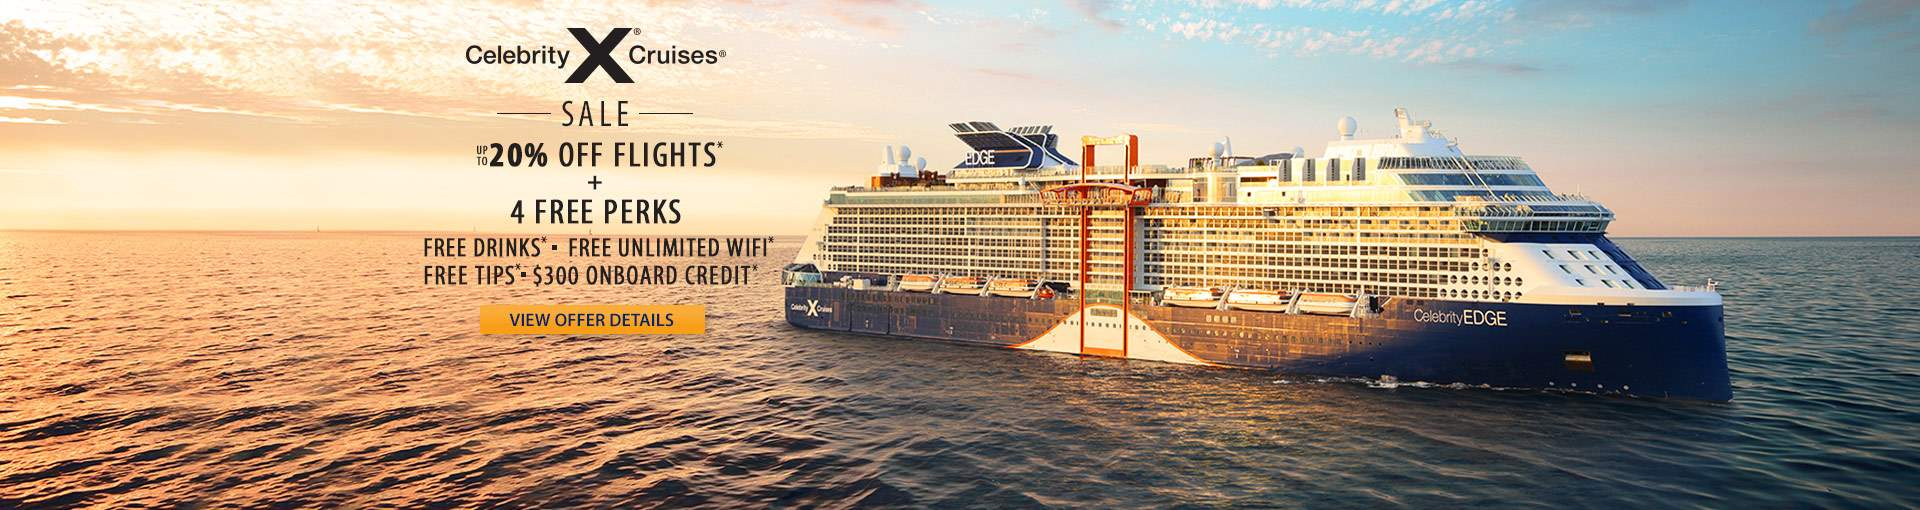 Celebrity Cruises: 20% Off Flights